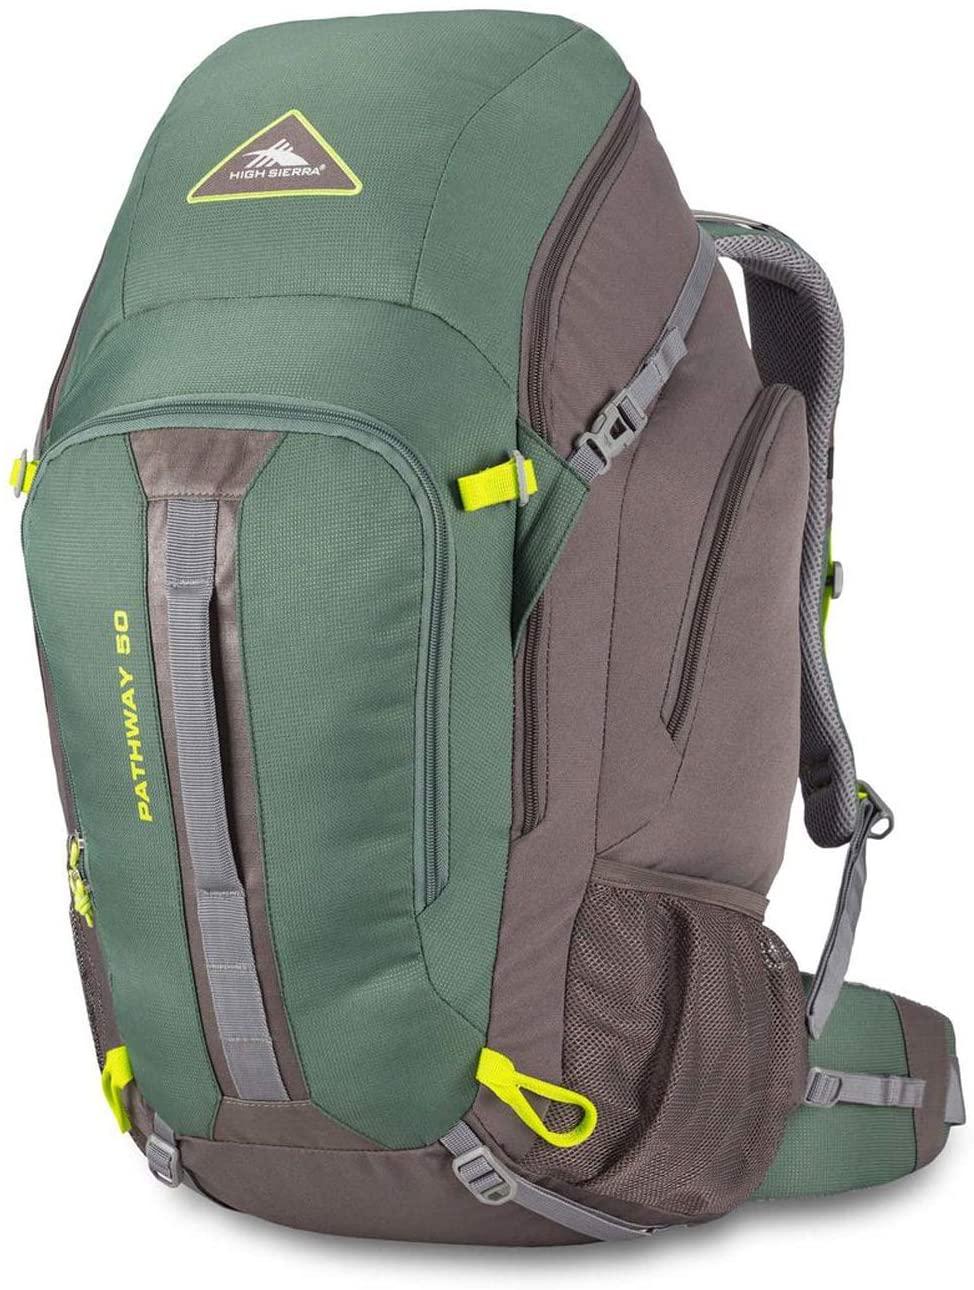 High Sierra Pathway Internal Frame Hiking Pack, Pine/Slate/Chartreuse, 50L